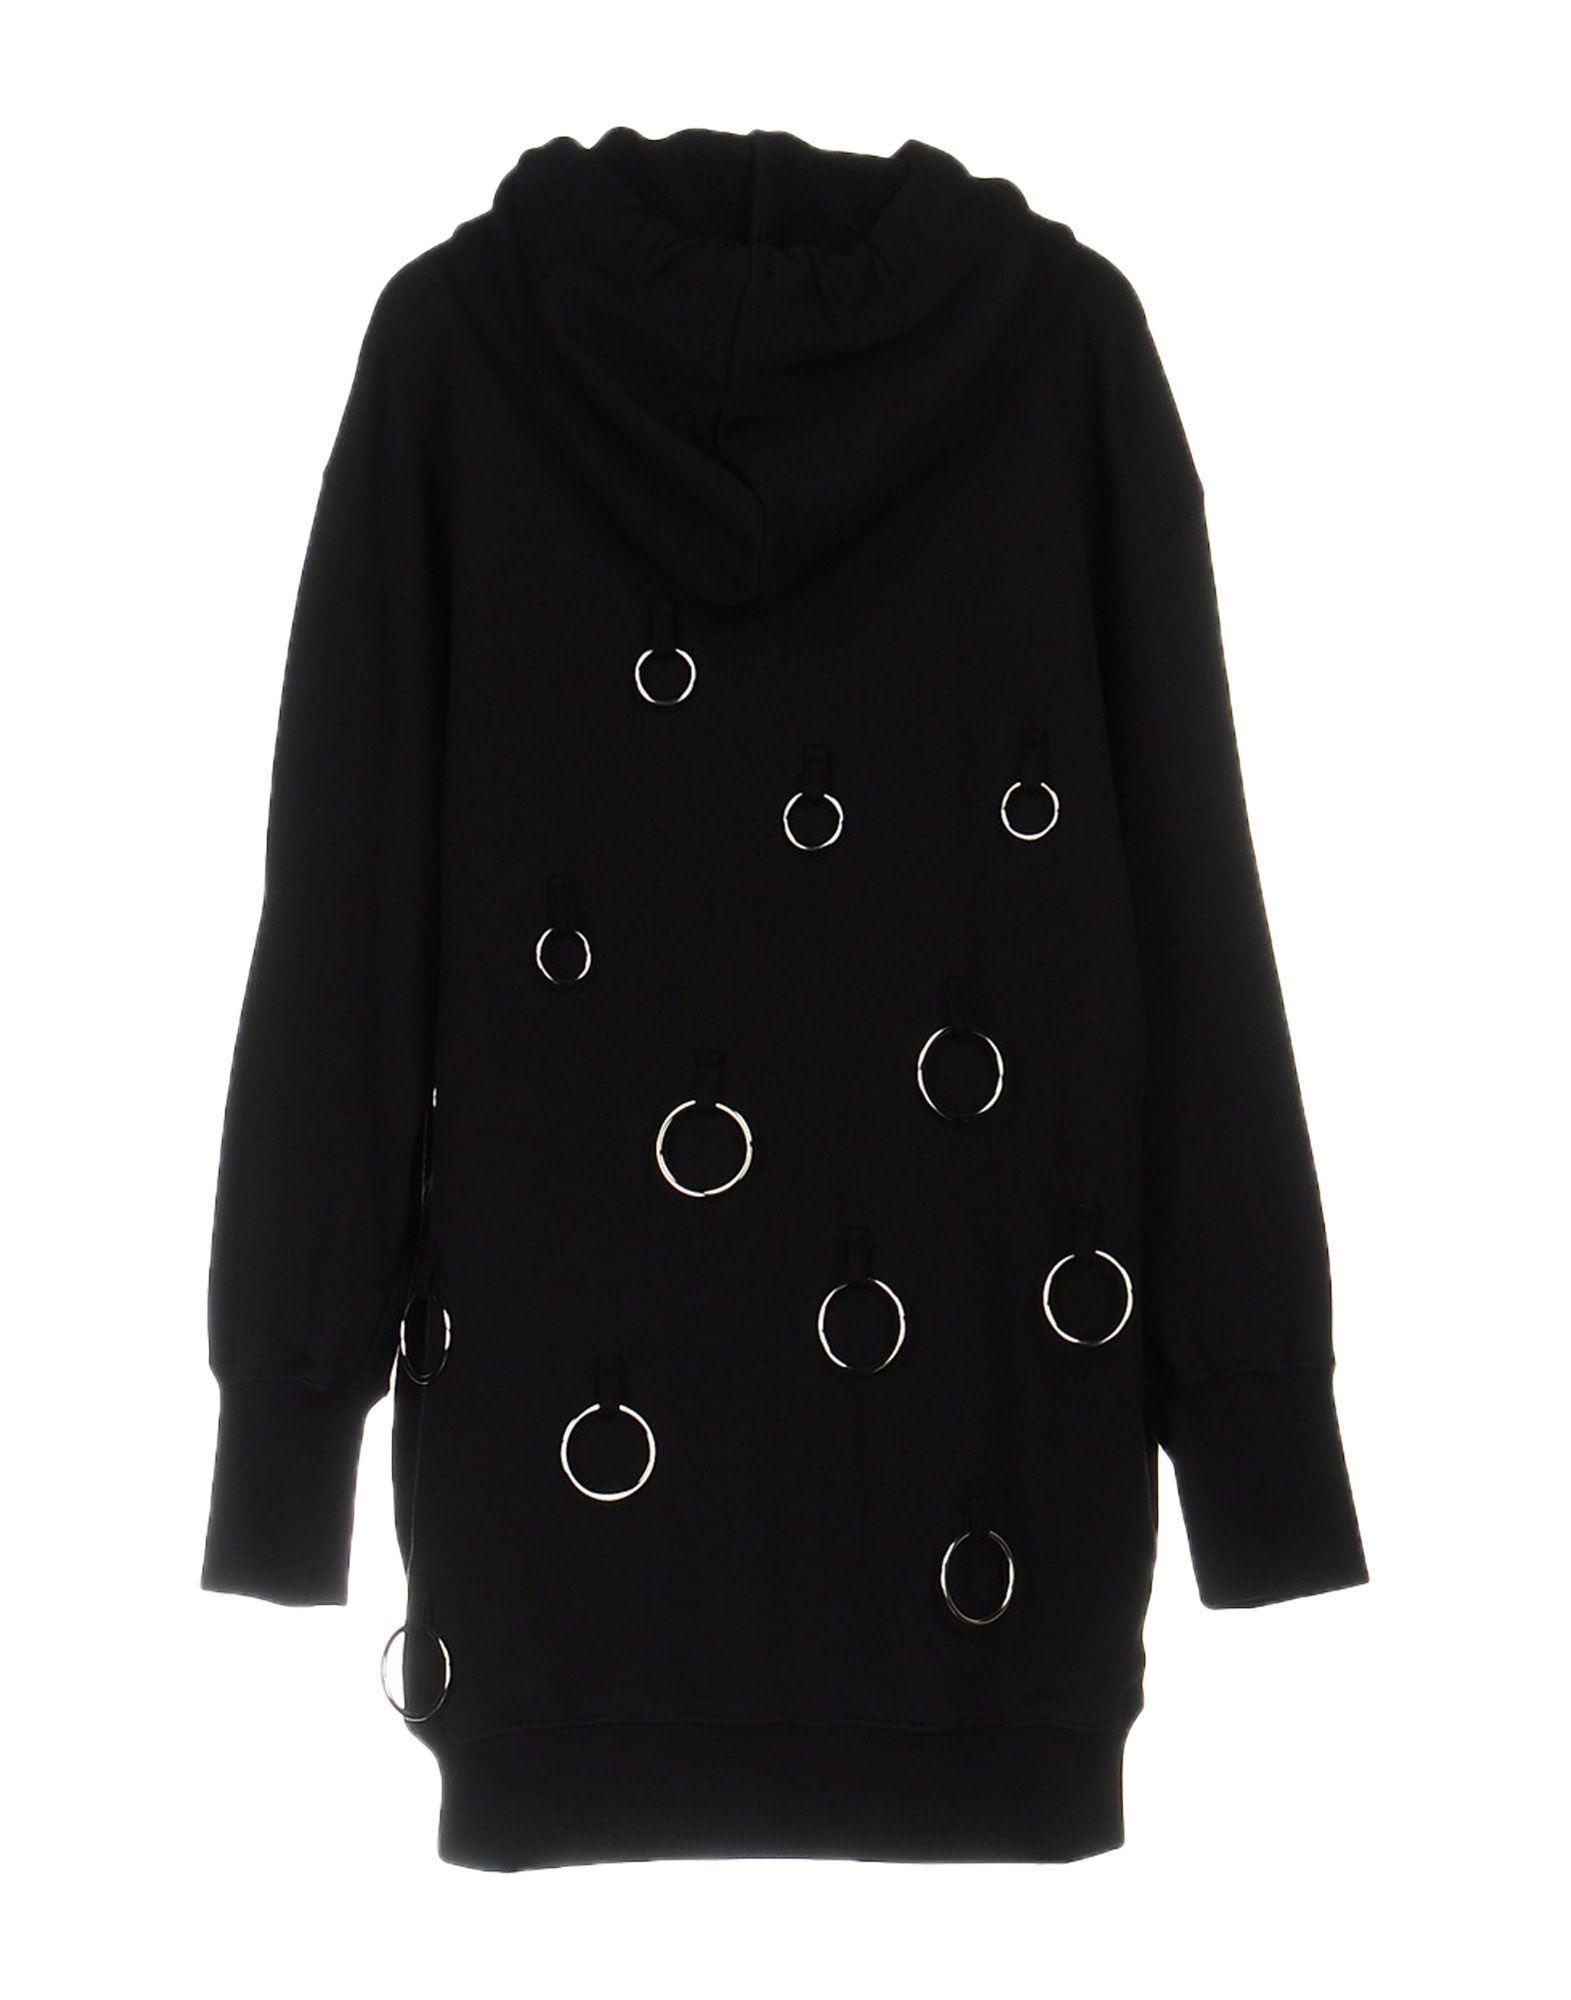 MSGM Black Cotton Sweatshirt Dress